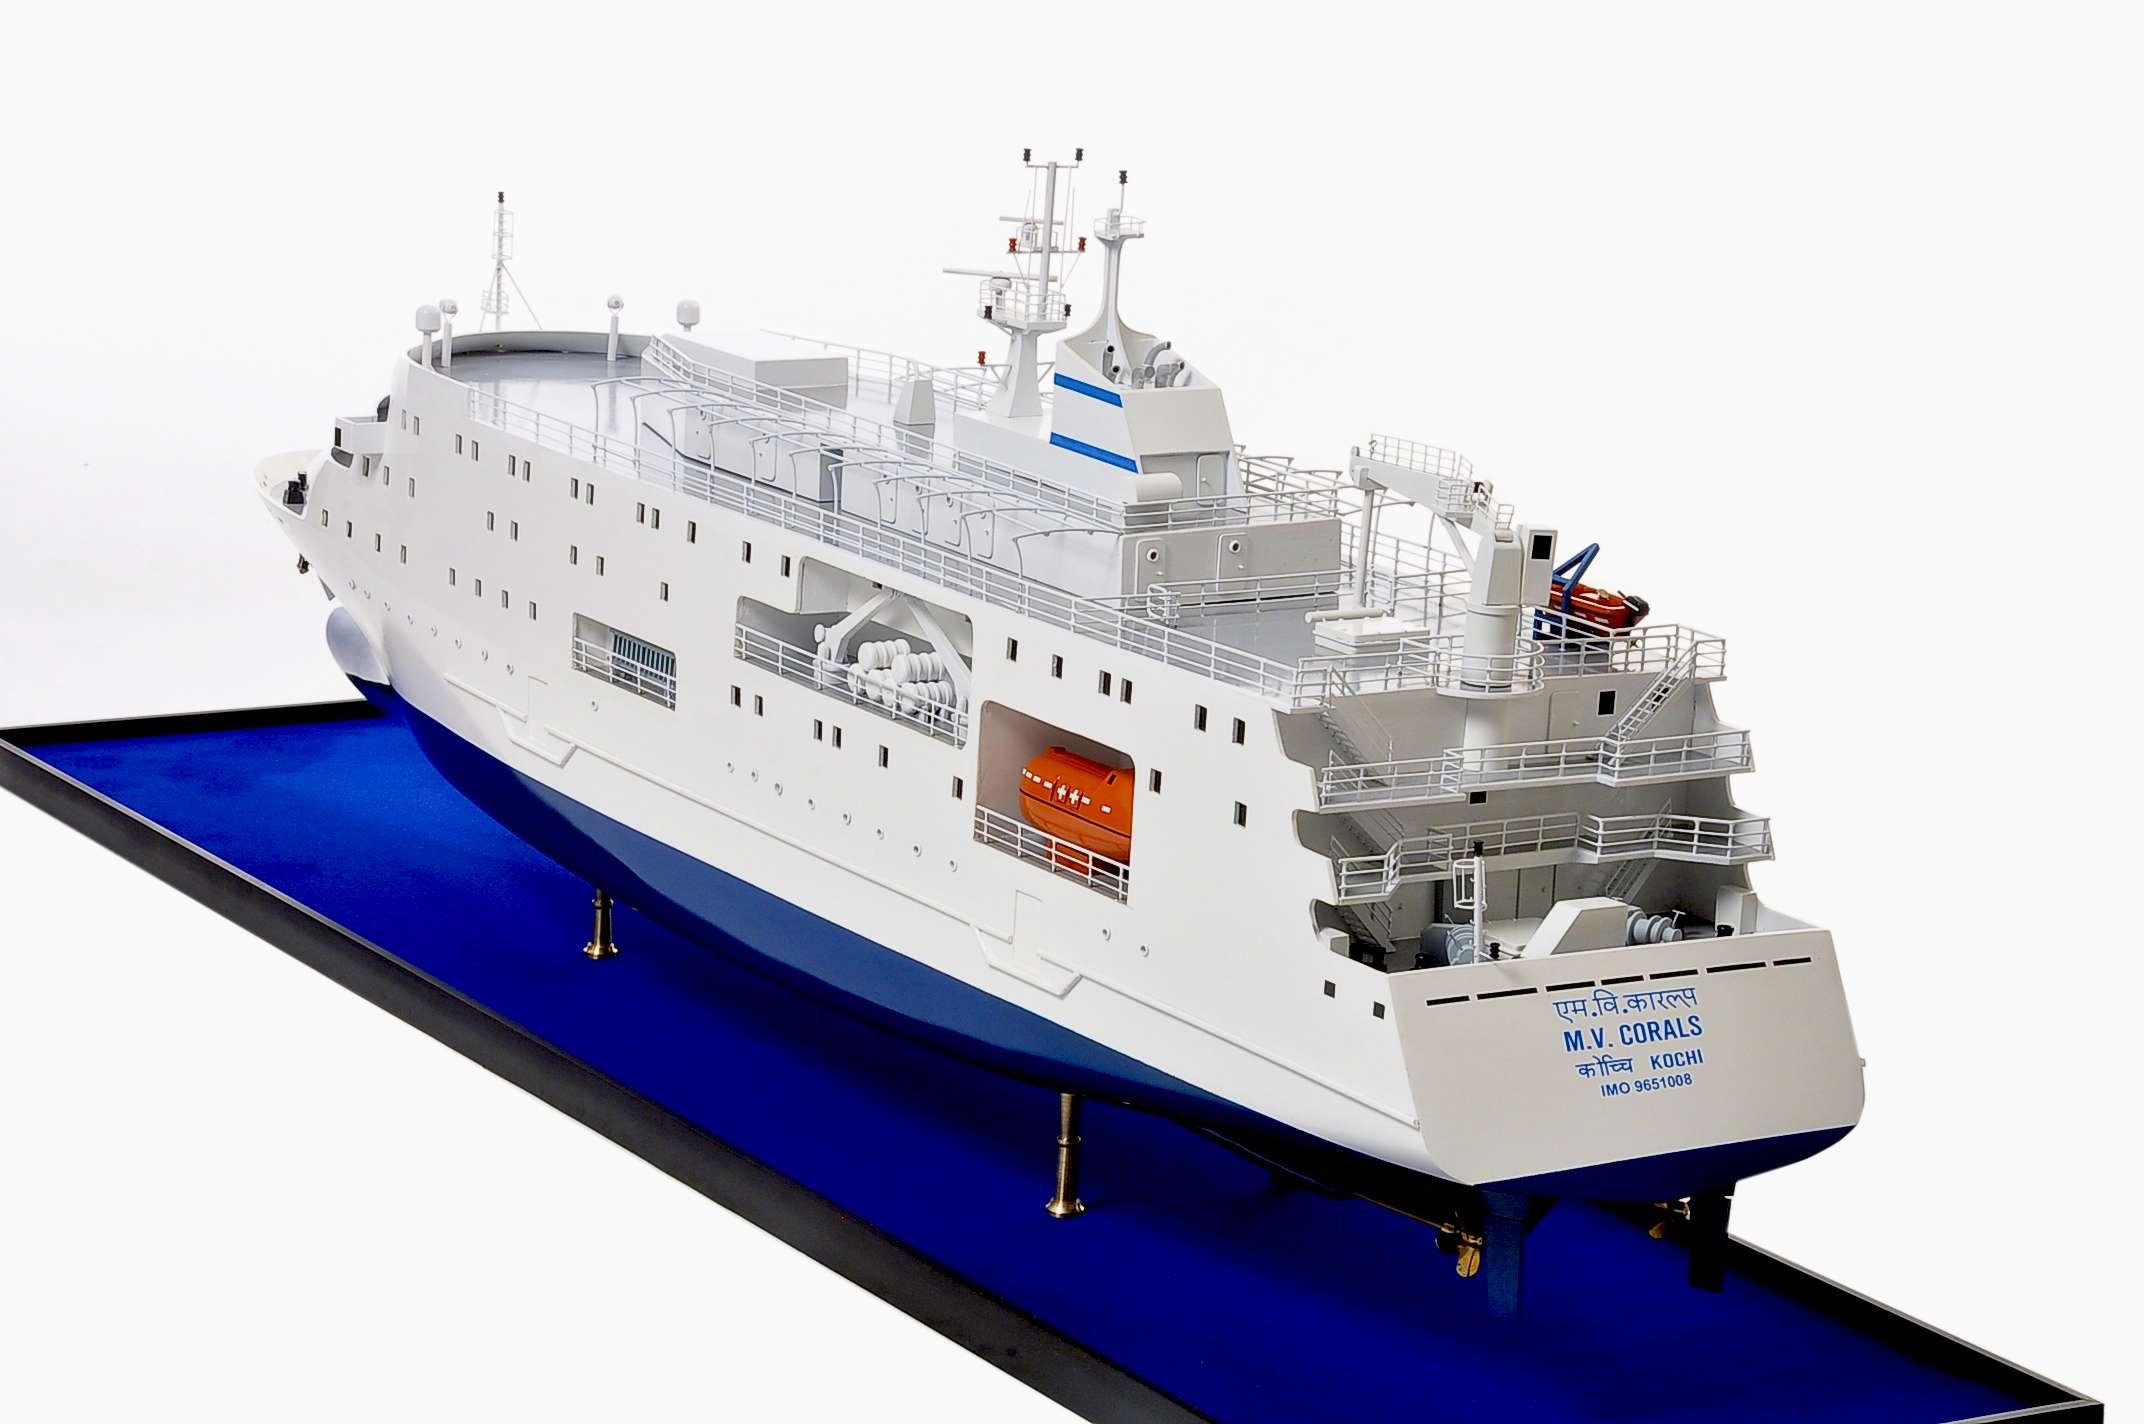 1477-4354-MV-Corals-Cargo-Vessel